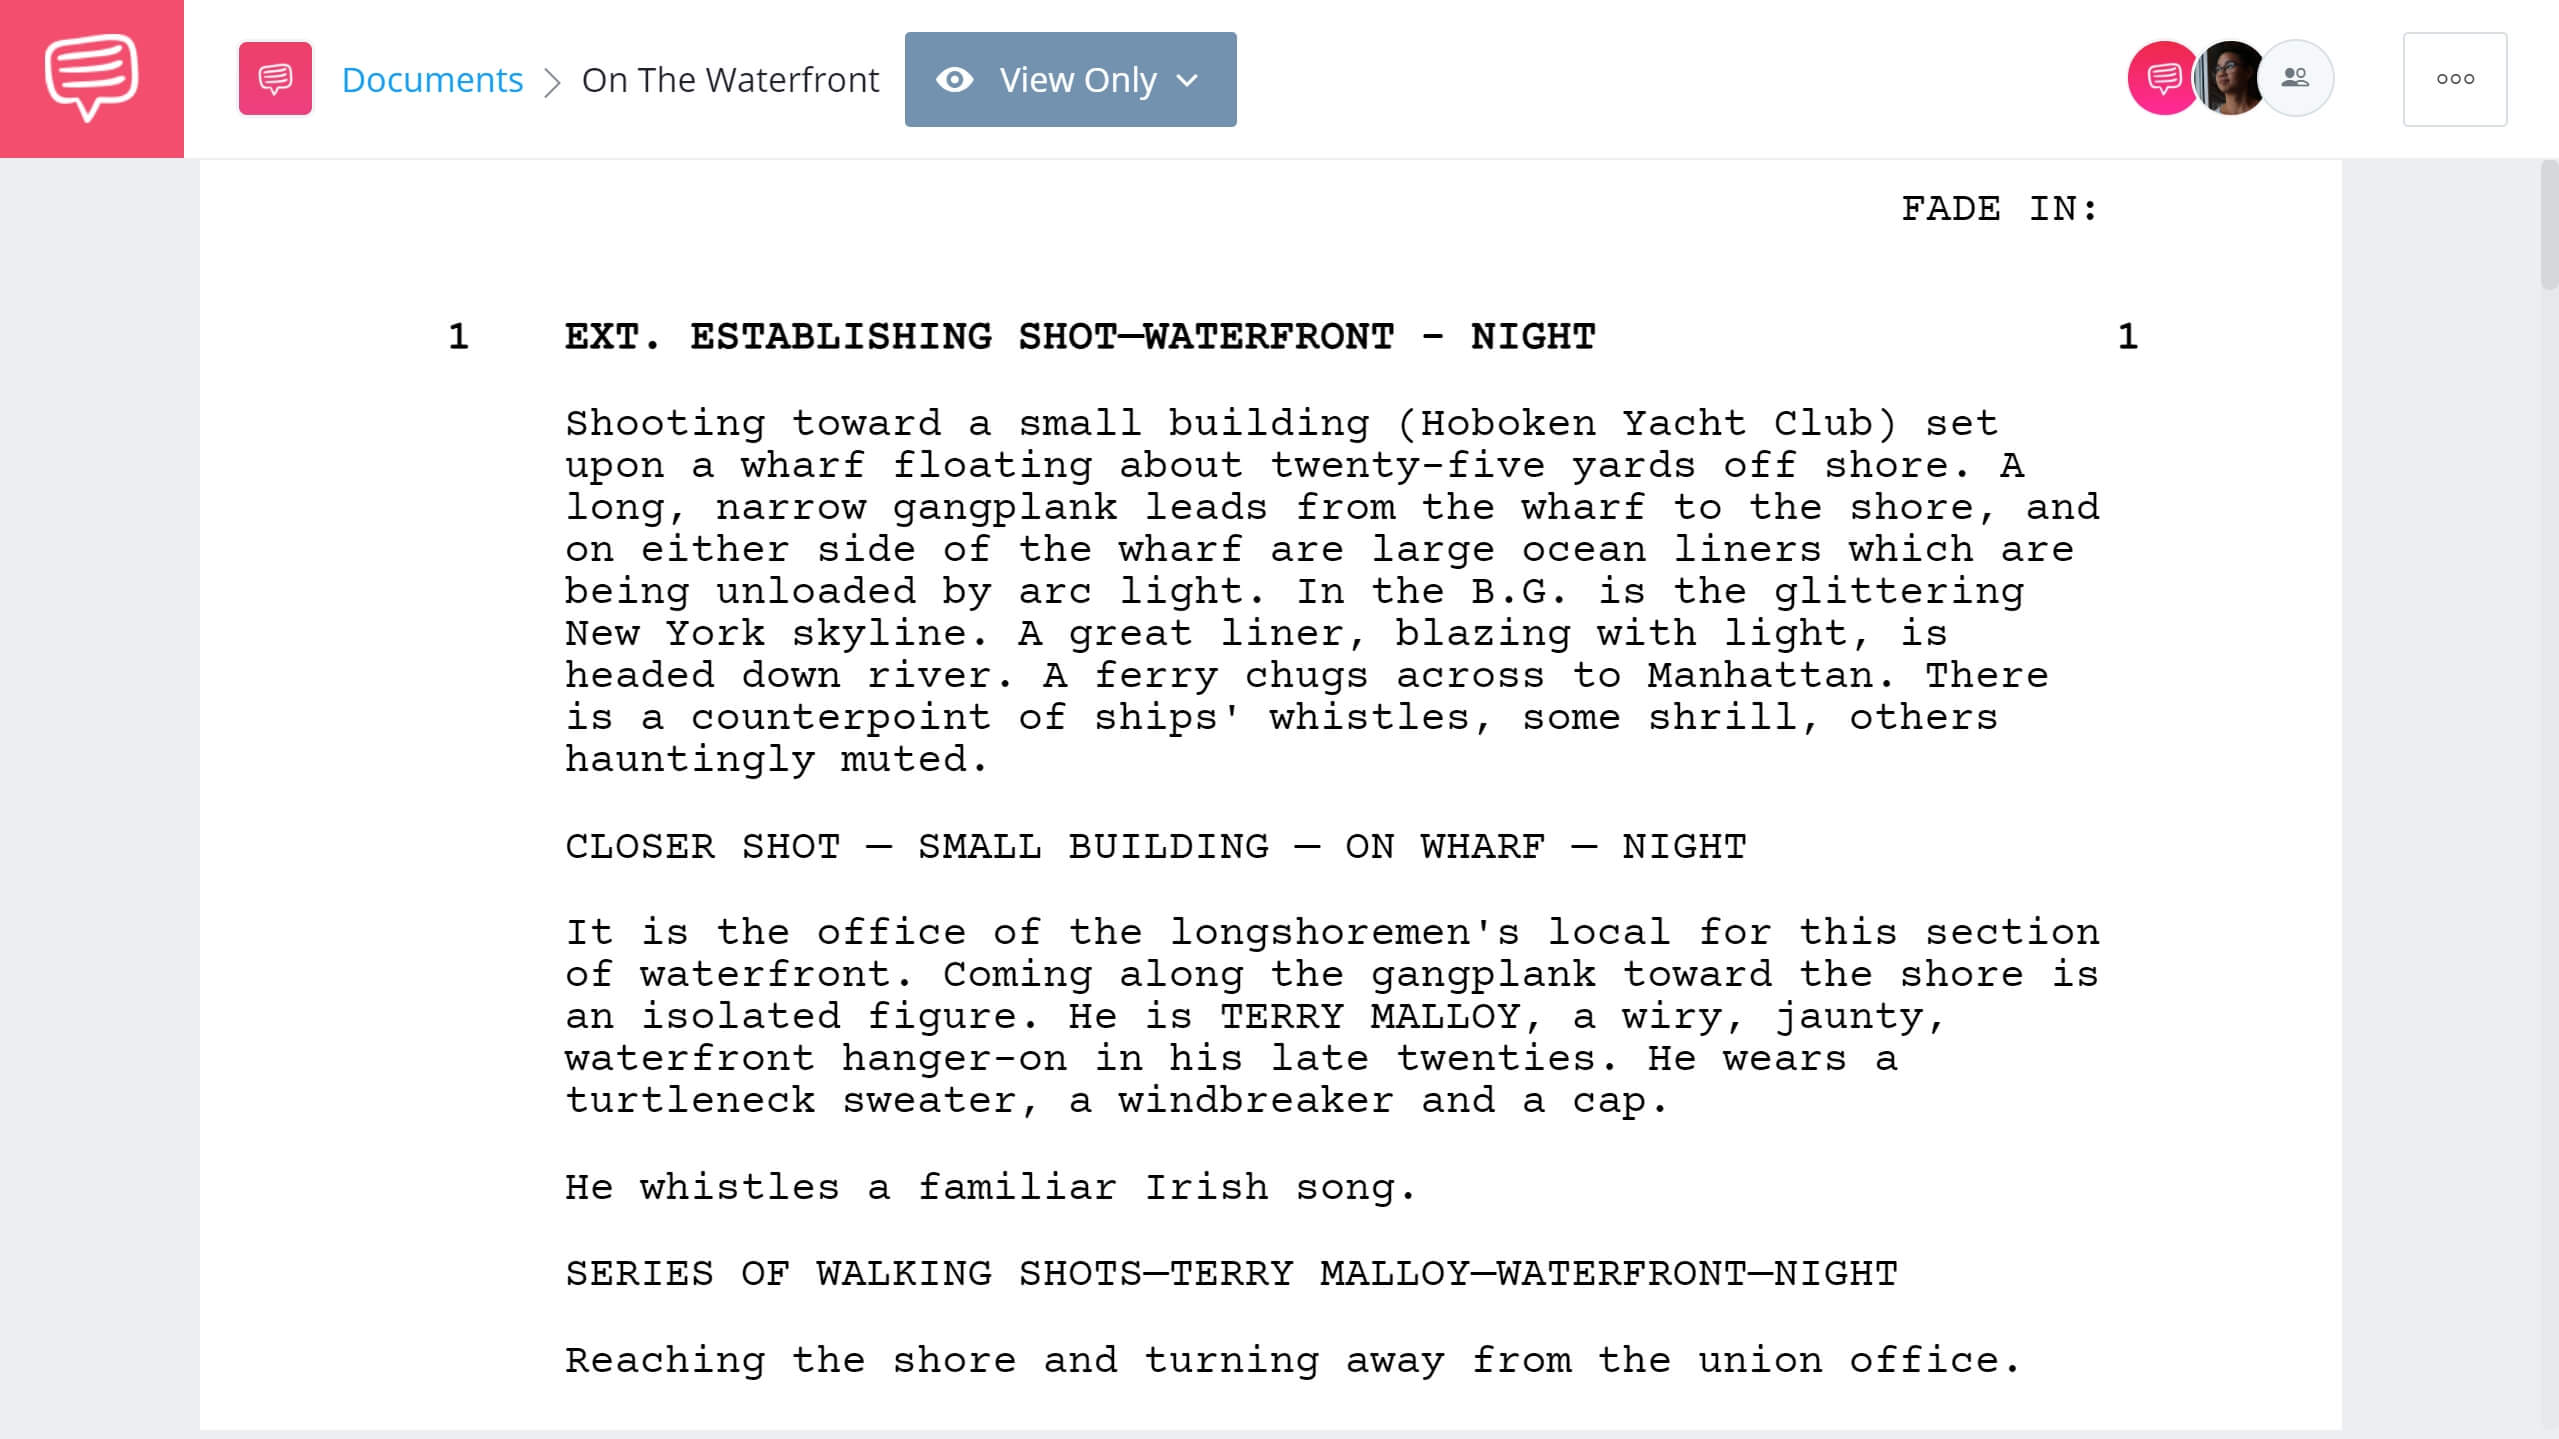 Best Original Screenplay Academy Award - On The Waterfornt Full Script PDF Download - StudioBinder Screenwriting Software